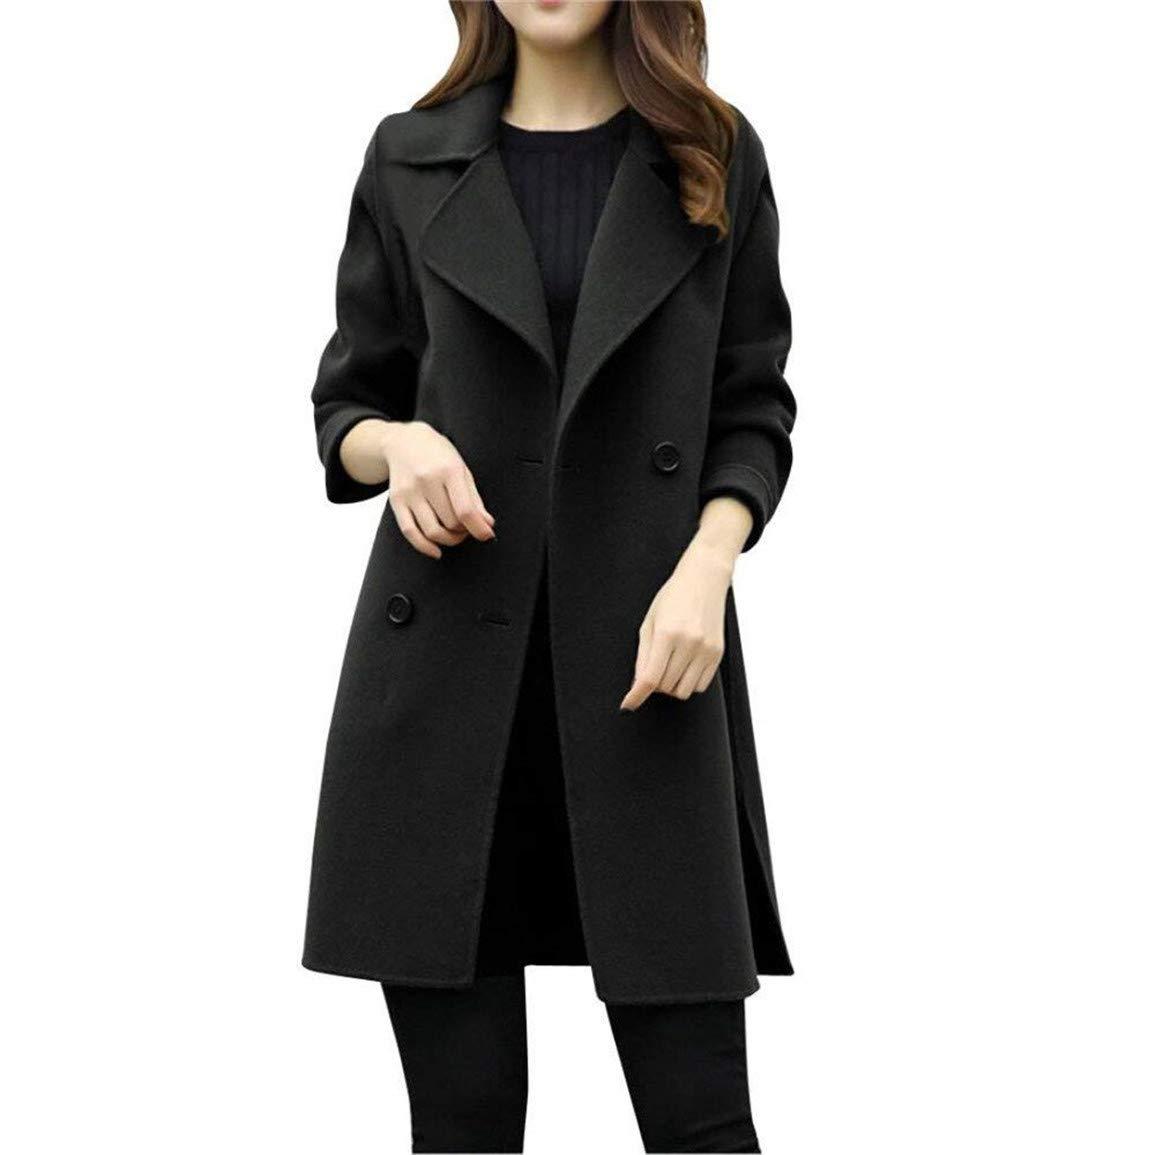 Ku-lee Womens Fashion Warm Coat Jacket Long Slim Coat for Autumn Winter